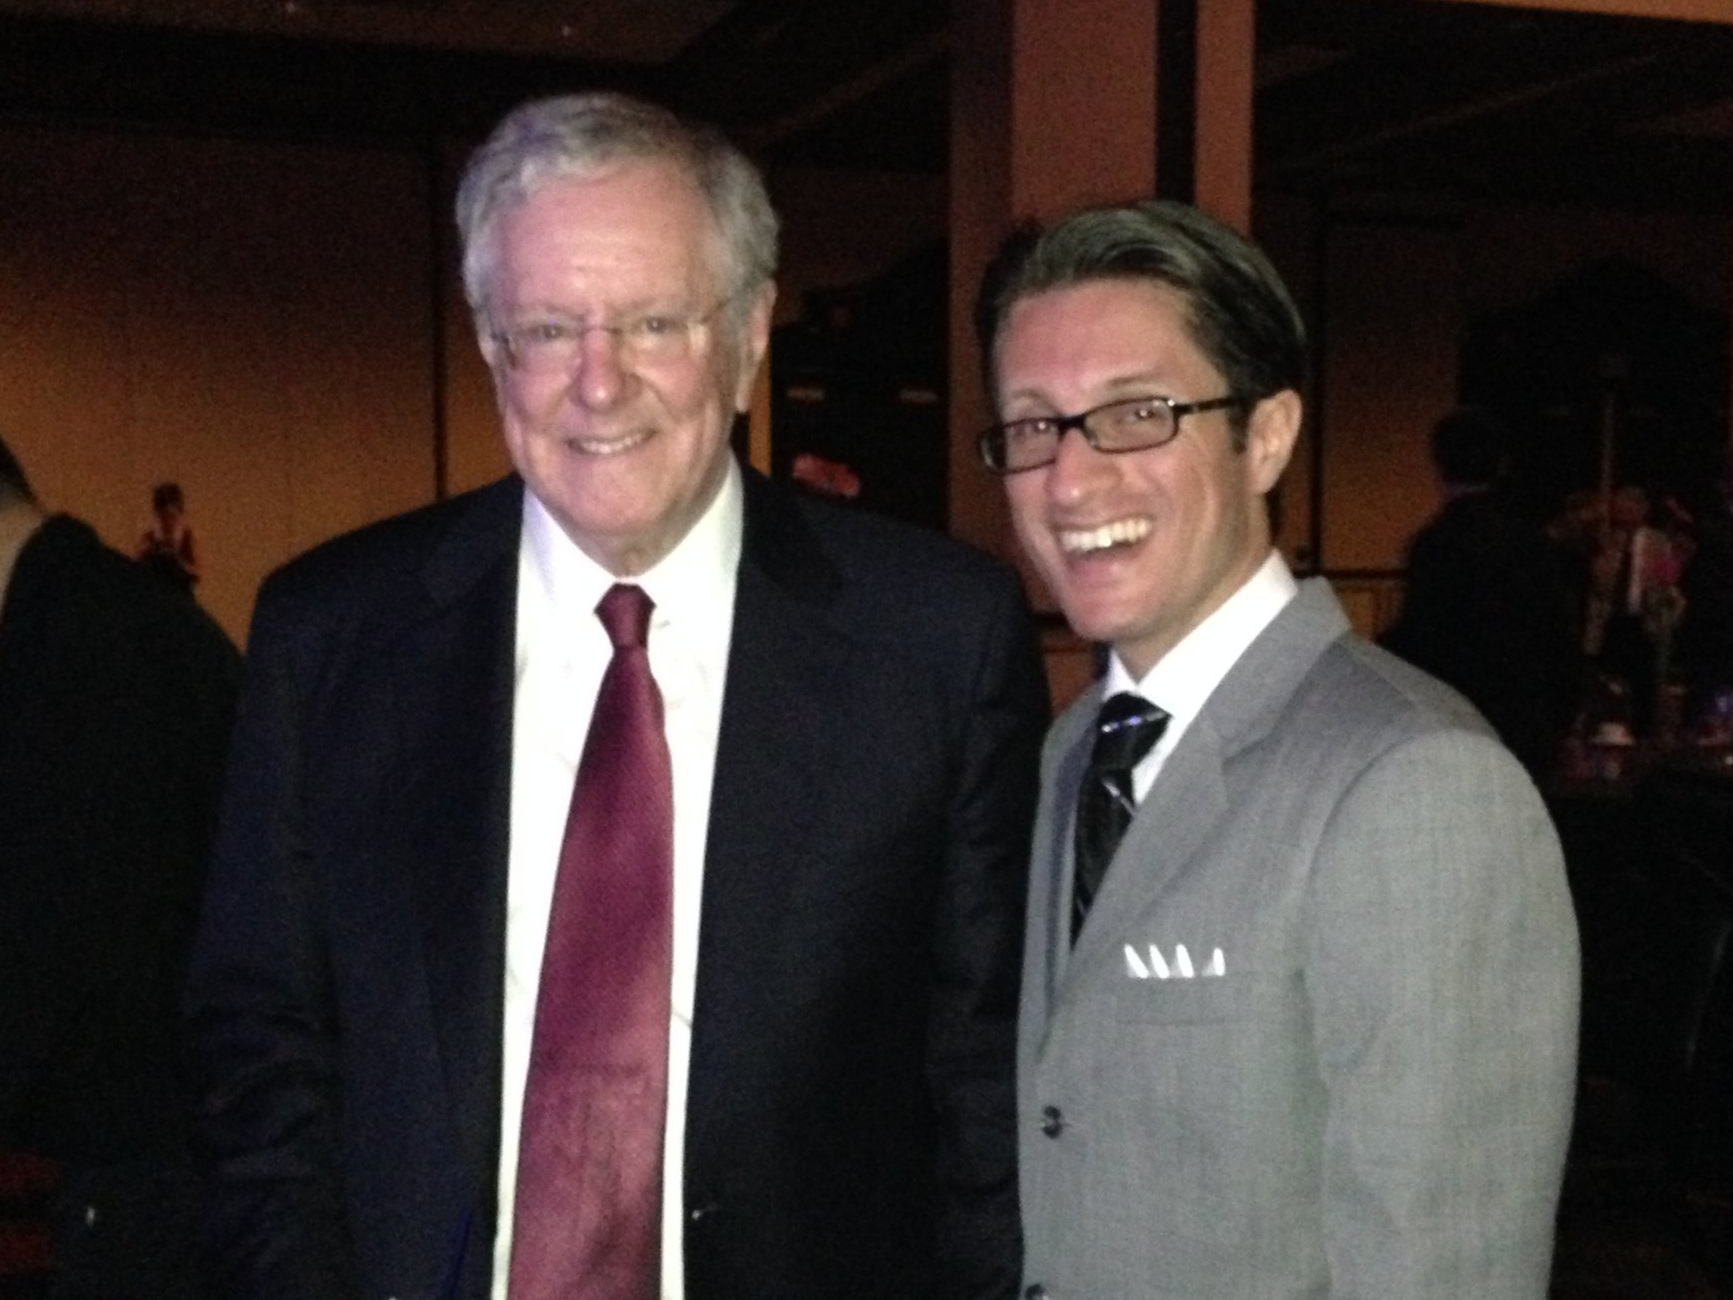 Dan Mangru & Steve Forbes - Chairman of Forbes Media